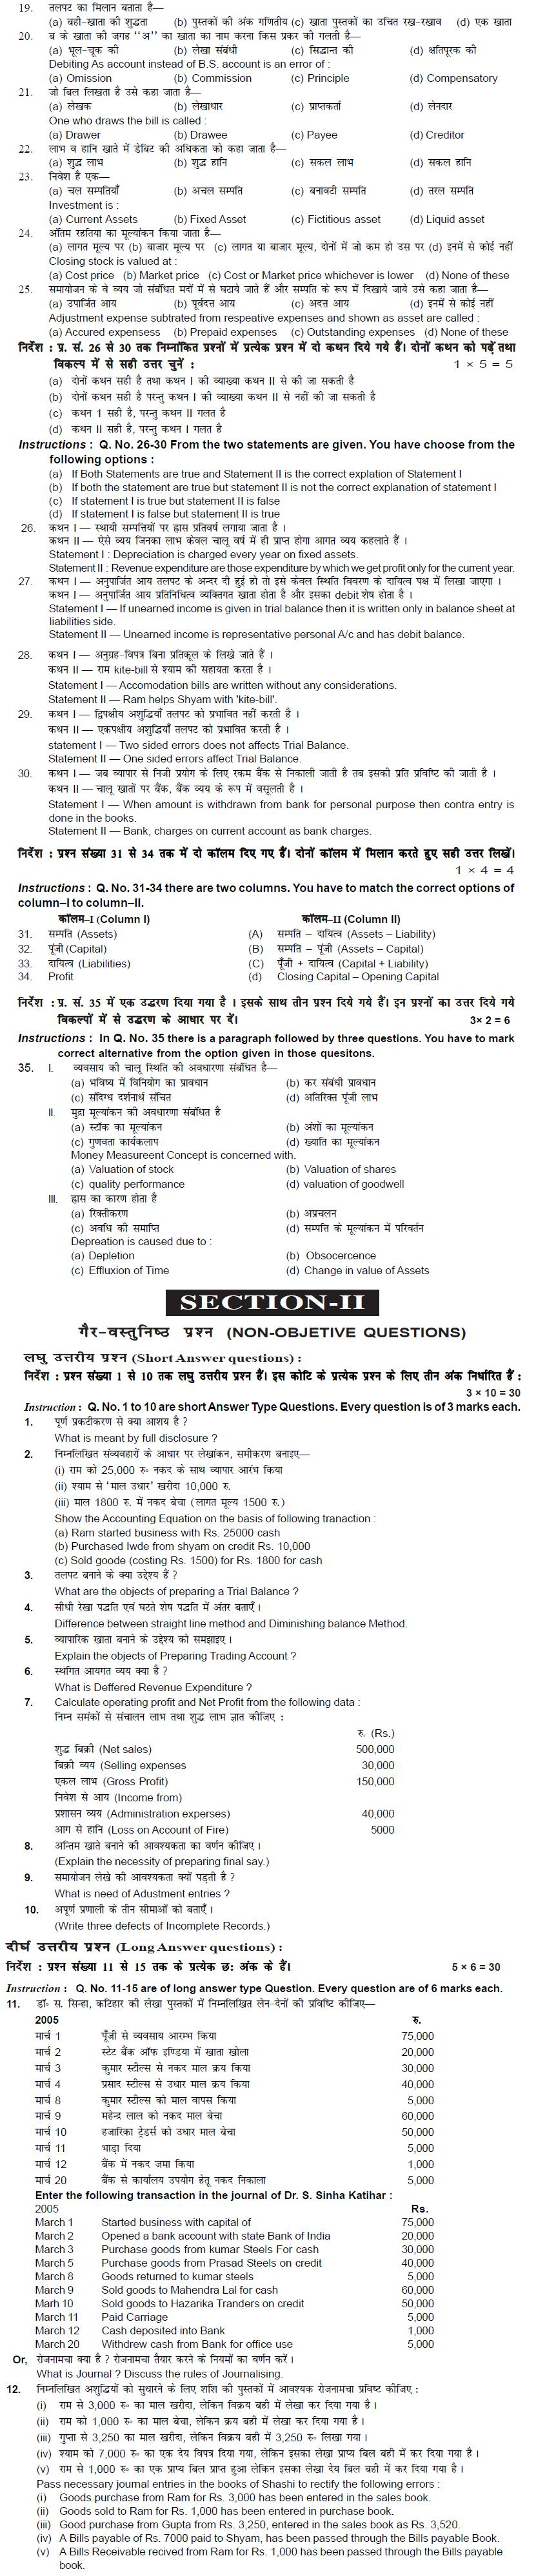 Bihar Board Class XI Commerce Model Question Papers - Accountancy